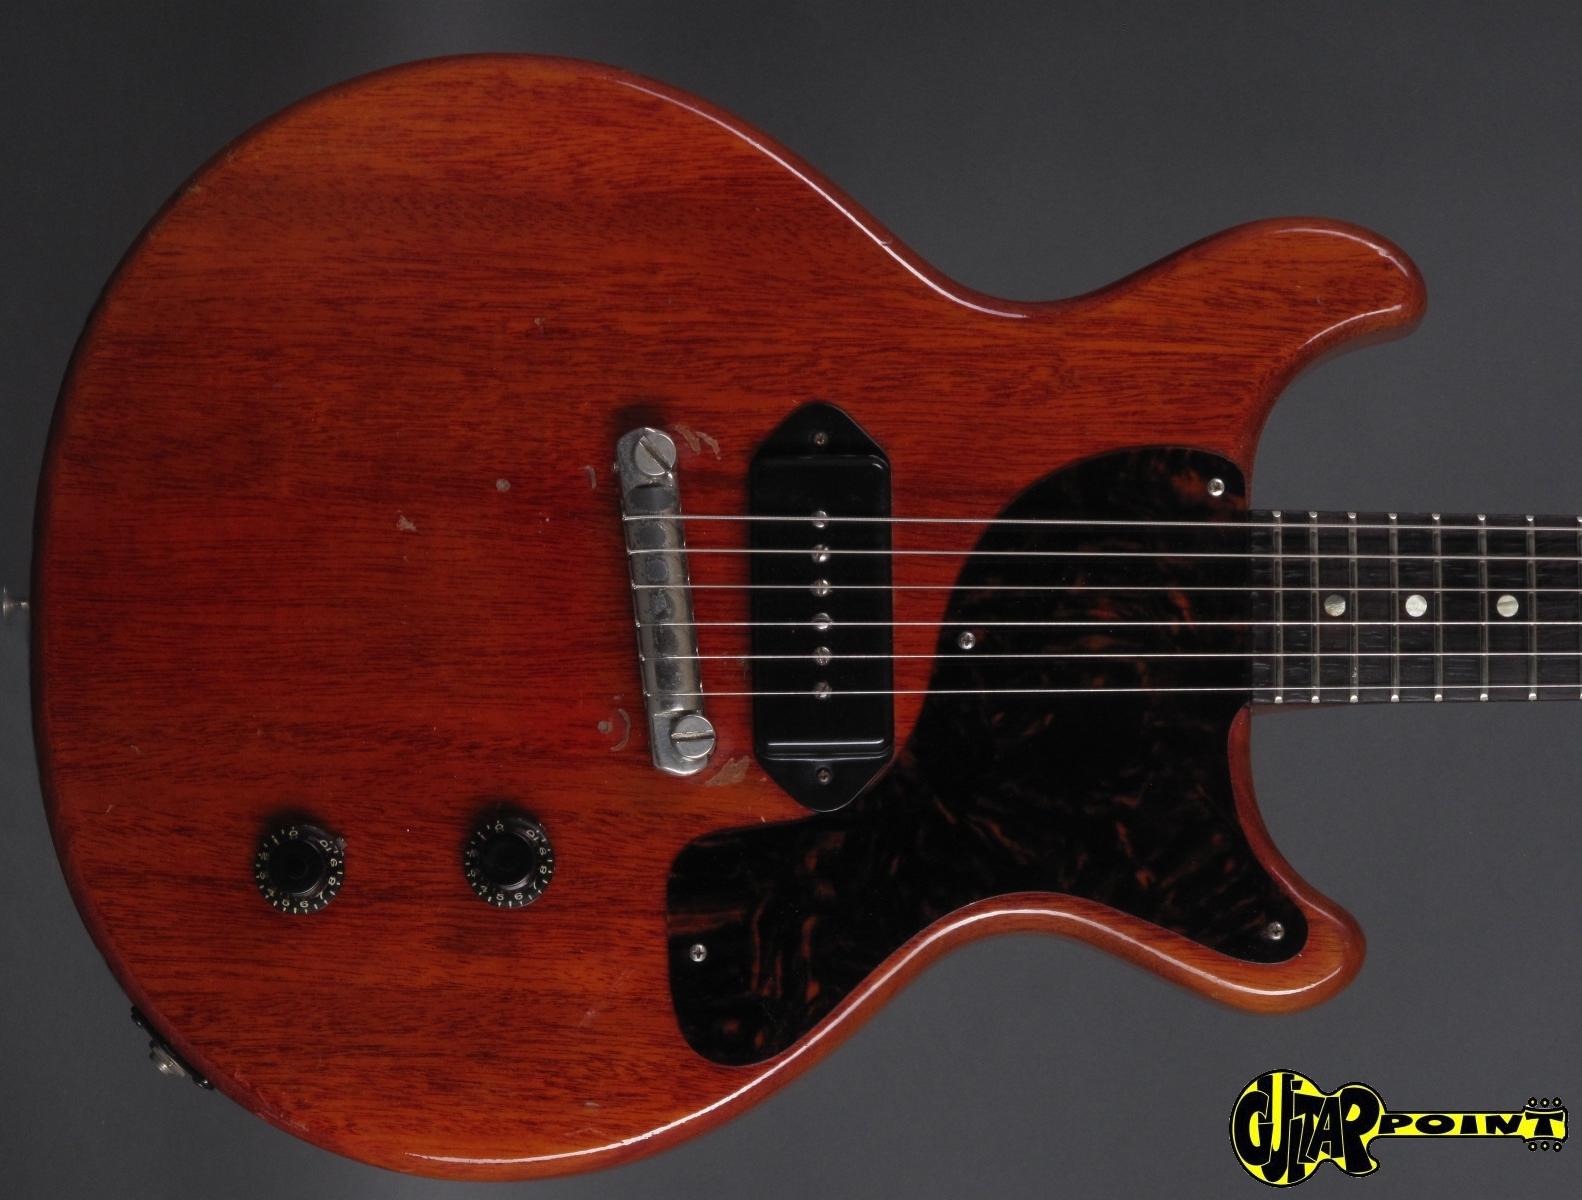 gibson les paul junior dc 1959 cherry guitar for sale. Black Bedroom Furniture Sets. Home Design Ideas